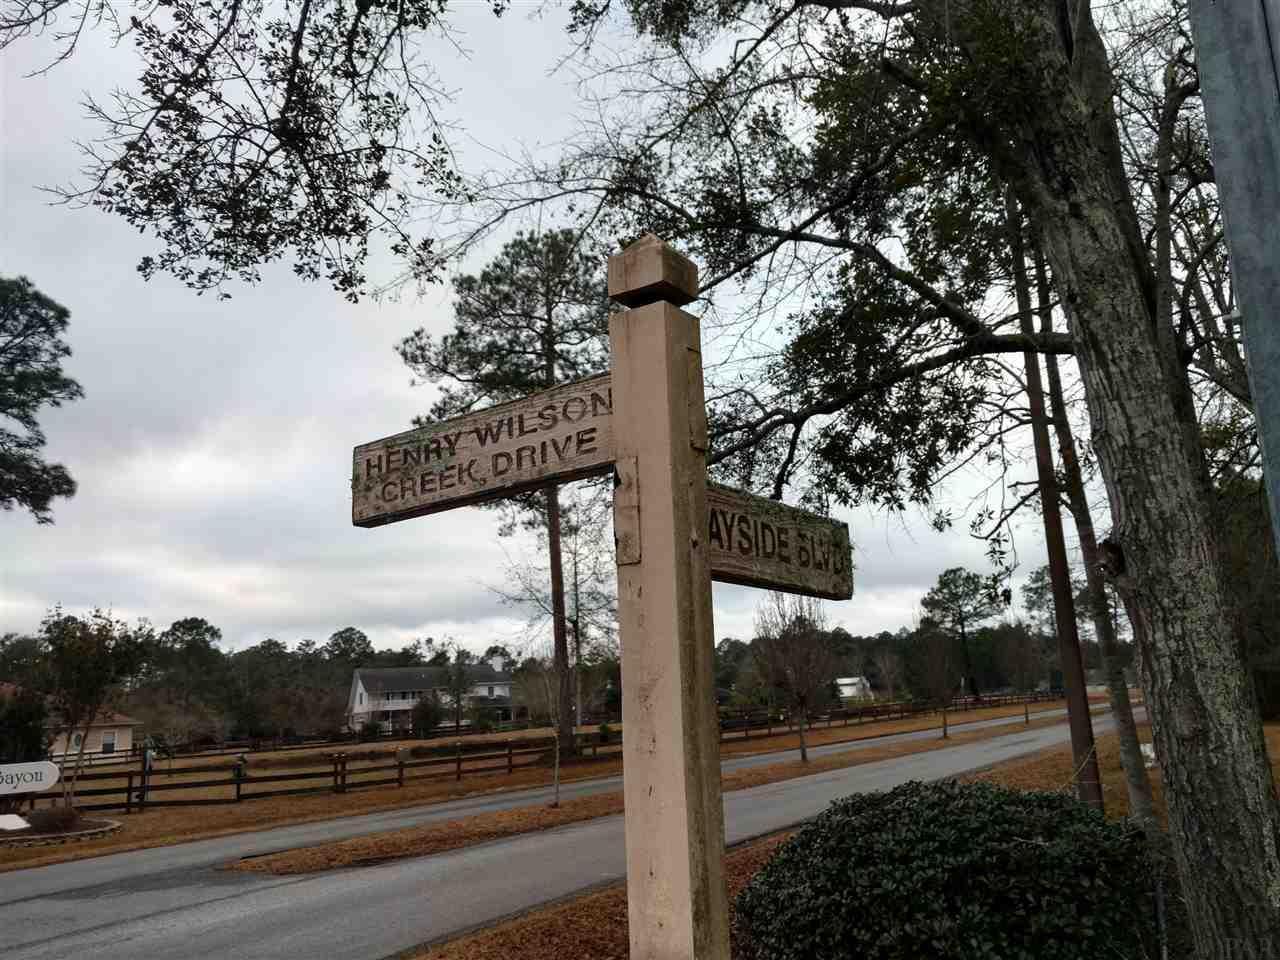 000 Henry Wilson Creek Dri, Milton, FL 32583